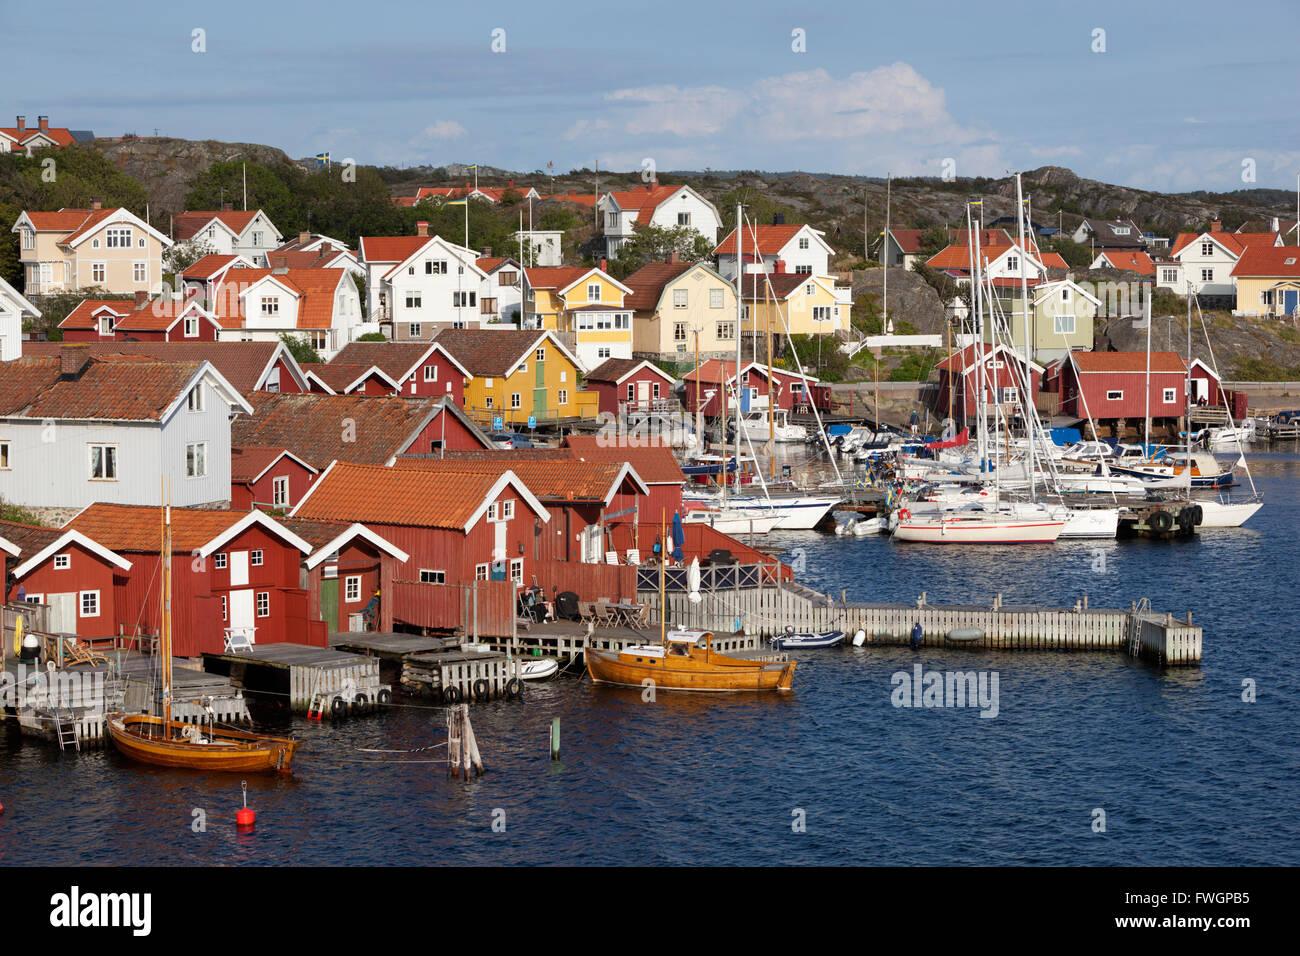 Falu red fishermen's houses in harbour, Halleviksstrand, Orust, Bohuslan Coast, Southwest Sweden, Sweden, Scandinavia, - Stock Image